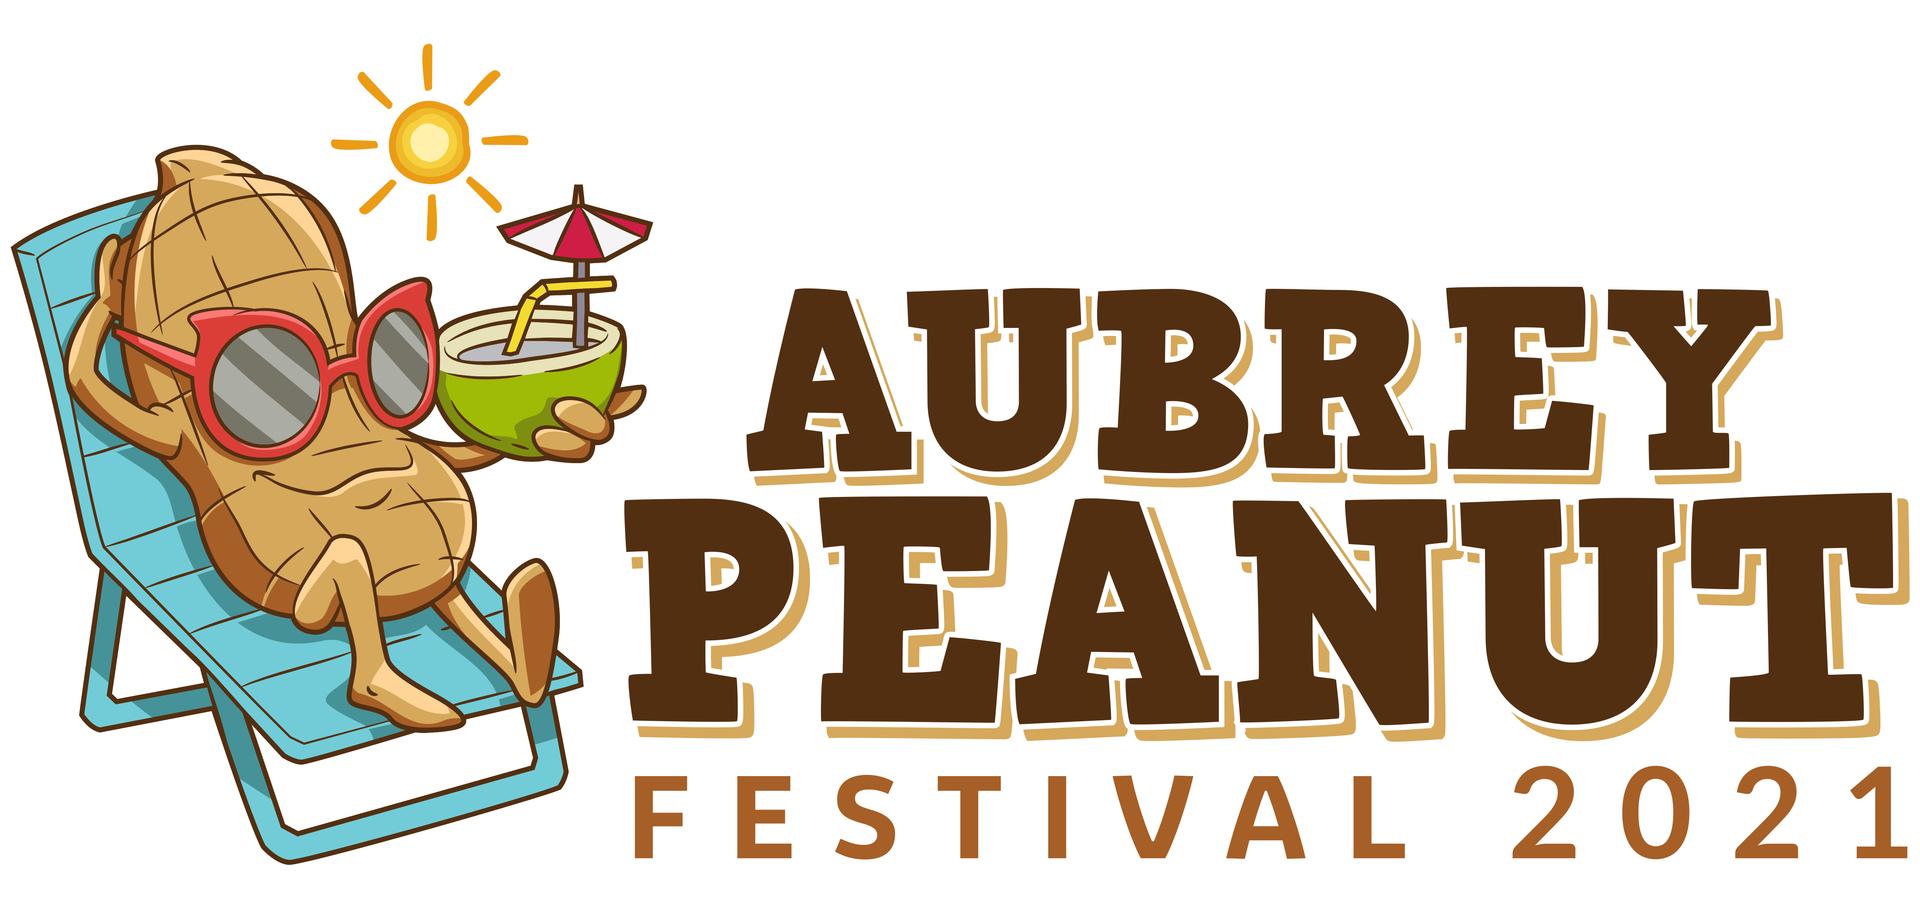 Aubrey Peanut Festival